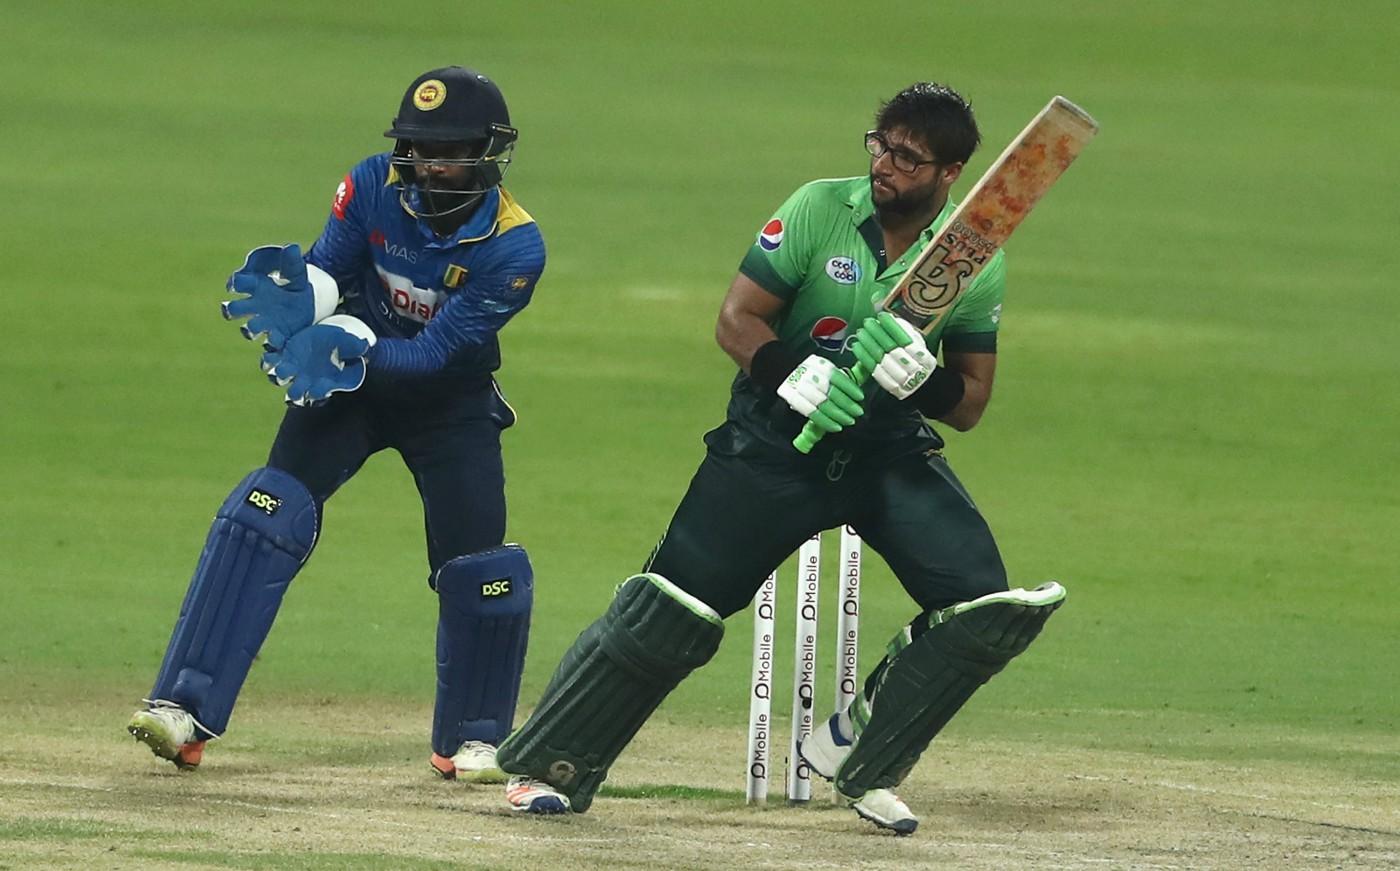 Pakistan vs Sri Lanka 3rd ODI Highlights